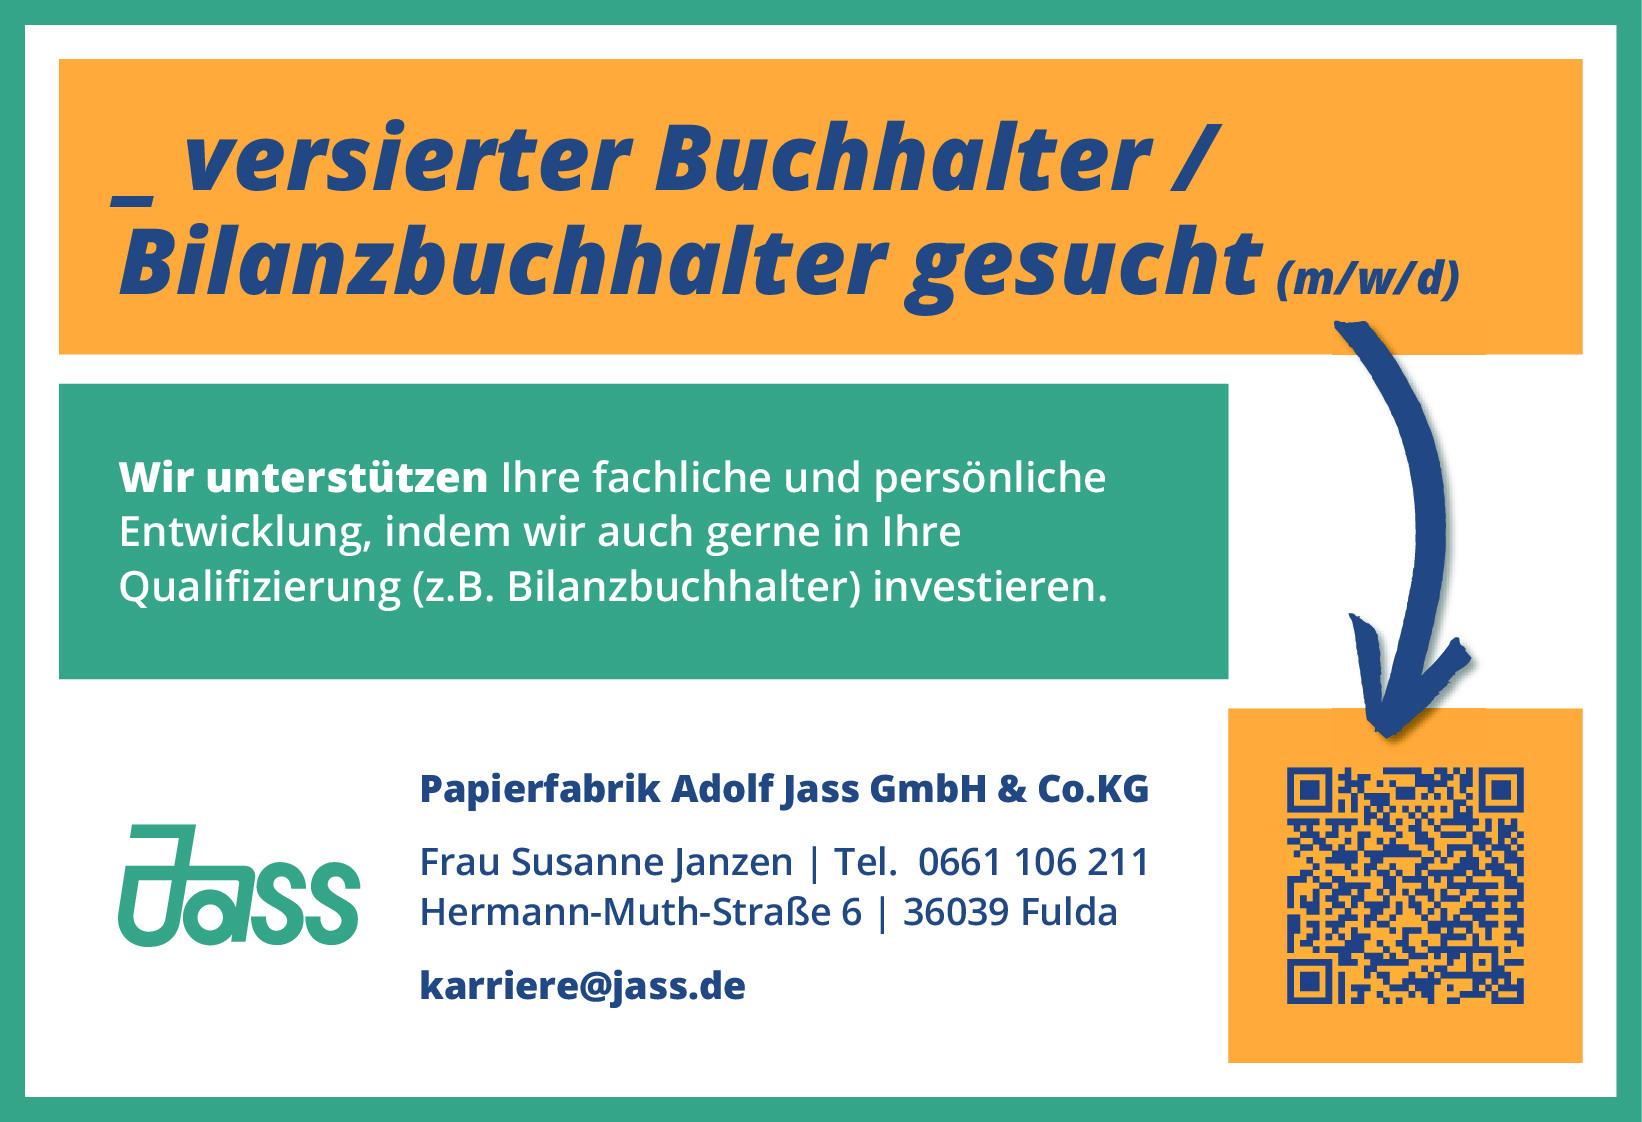 Buchhalter (m/w/d), Bilanzbuchhalter (m/w/d)